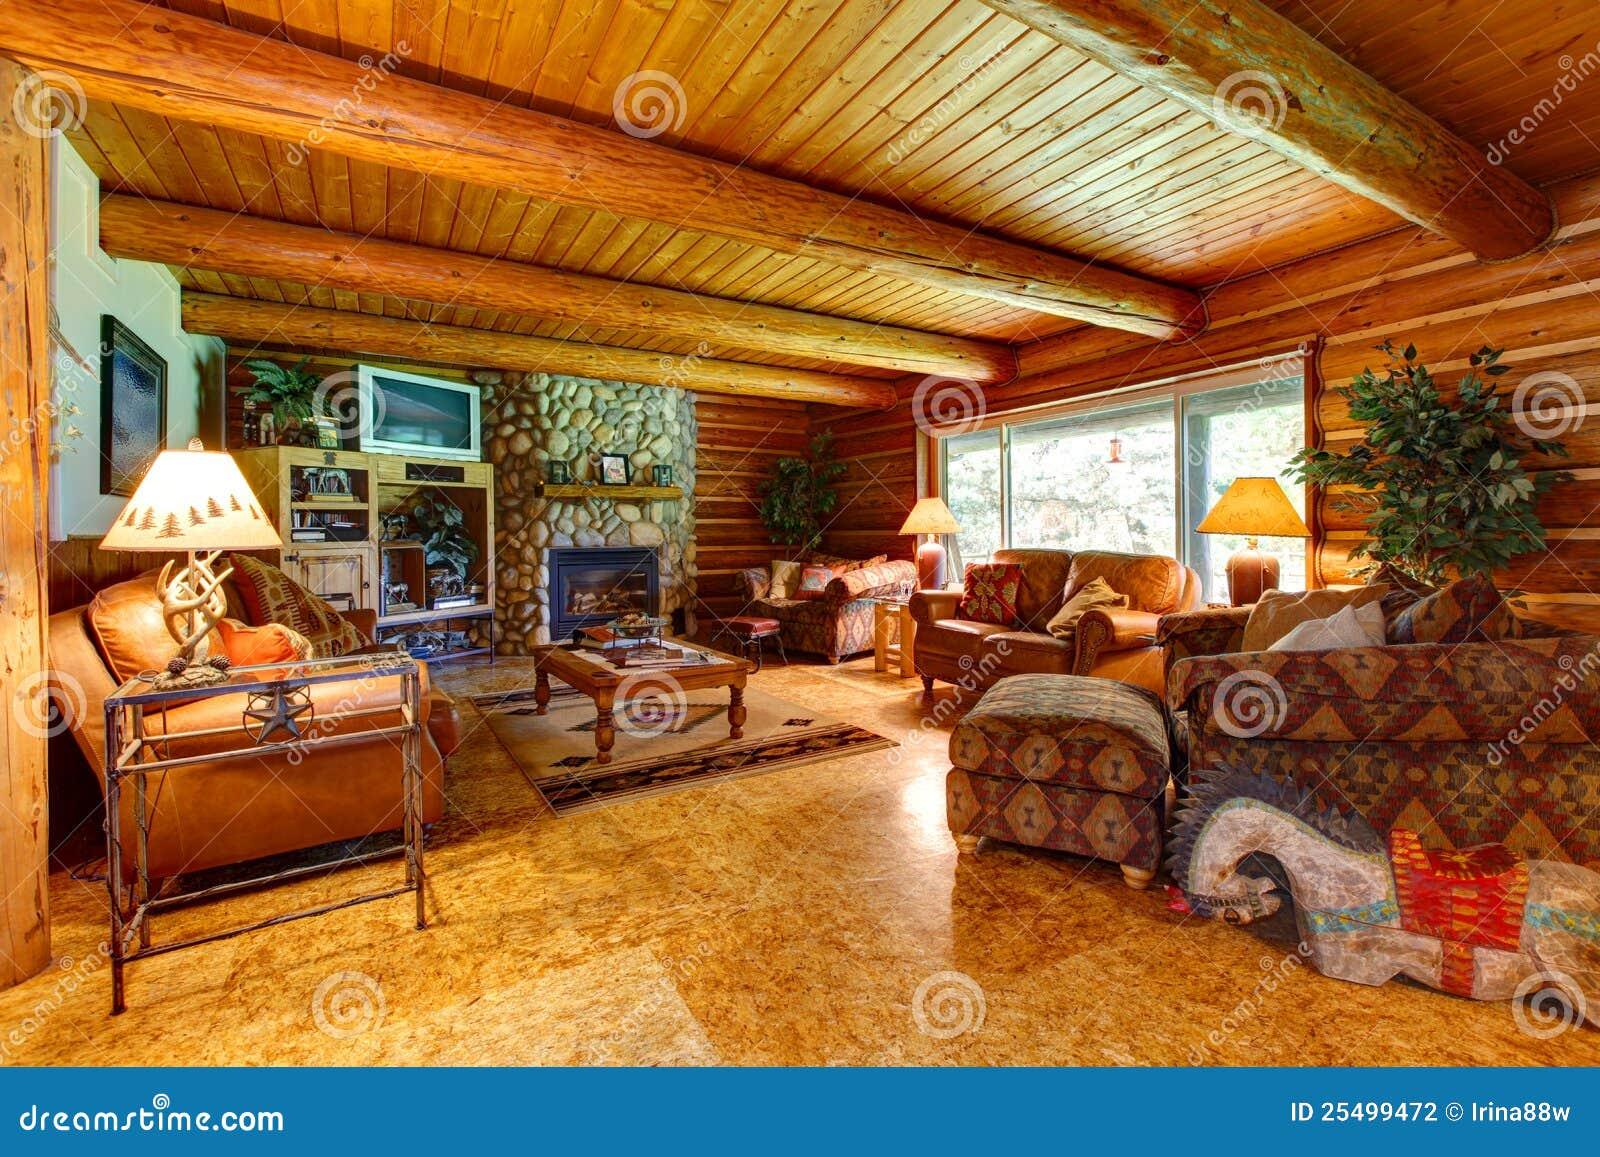 log cabin living room interior